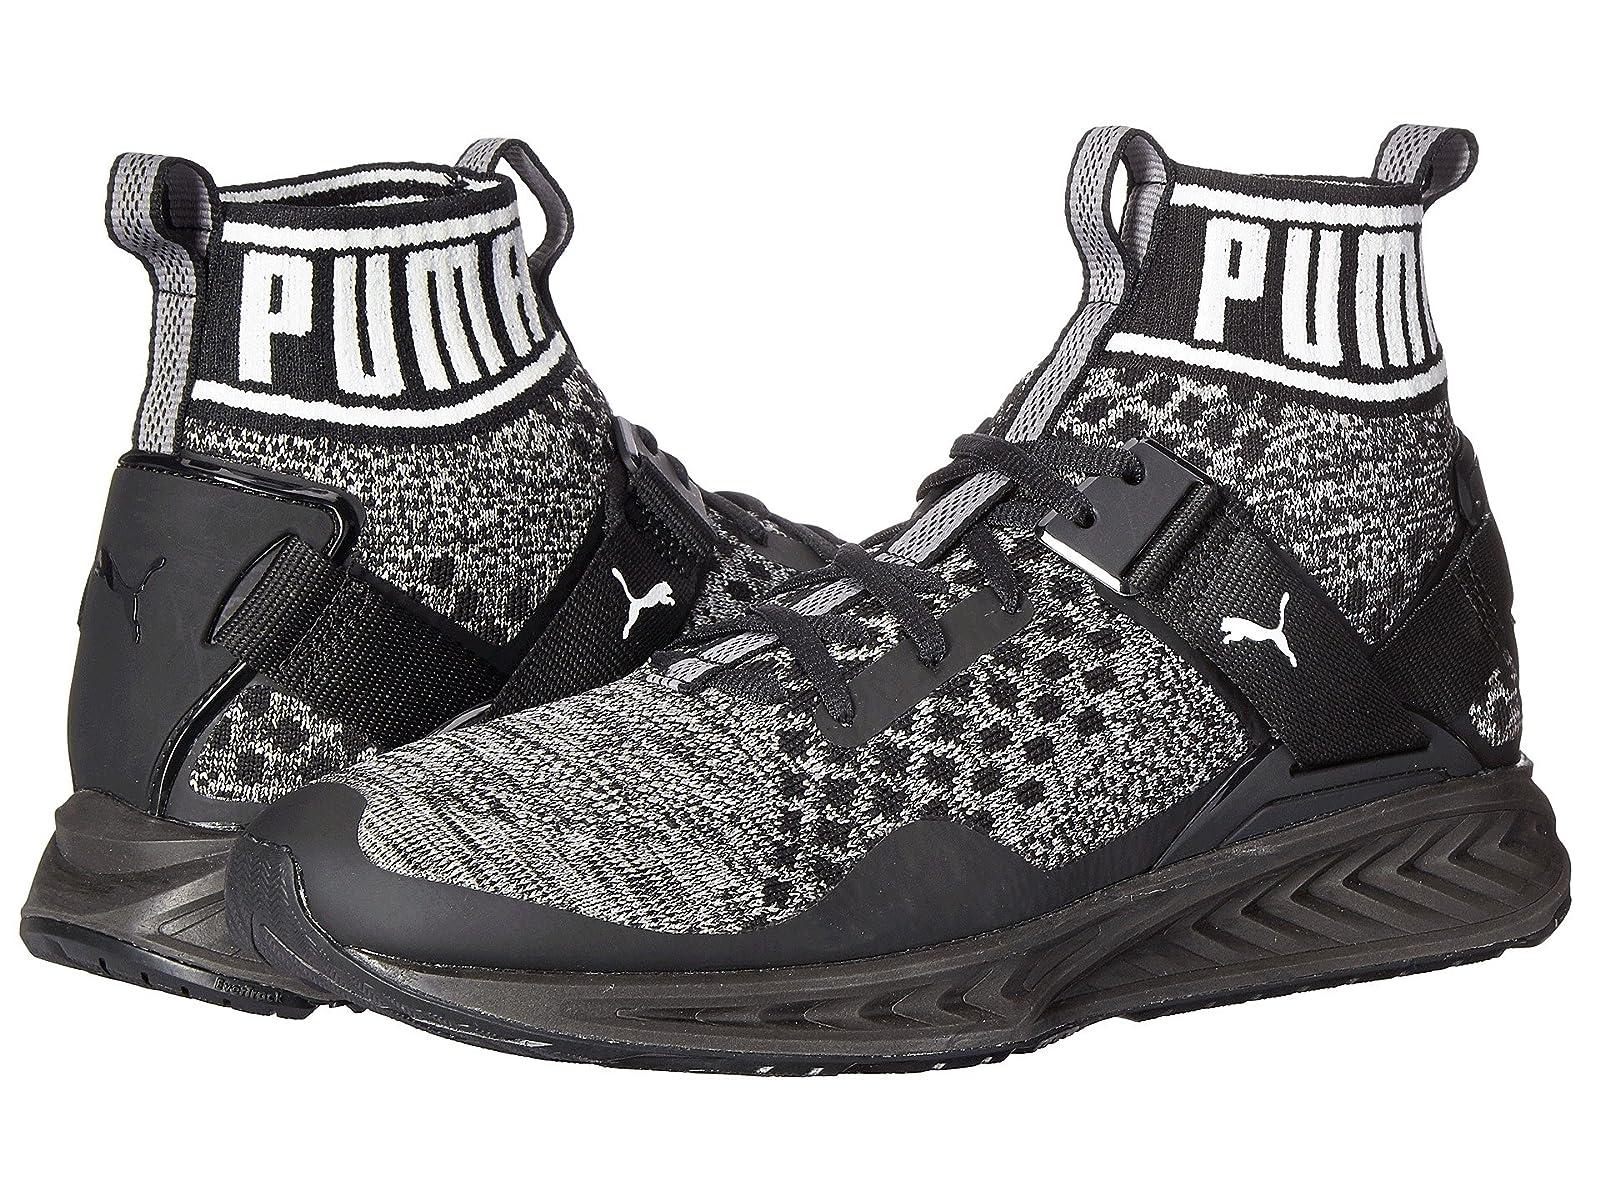 PUMA Ignite evoKNITAtmospheric grades have affordable shoes